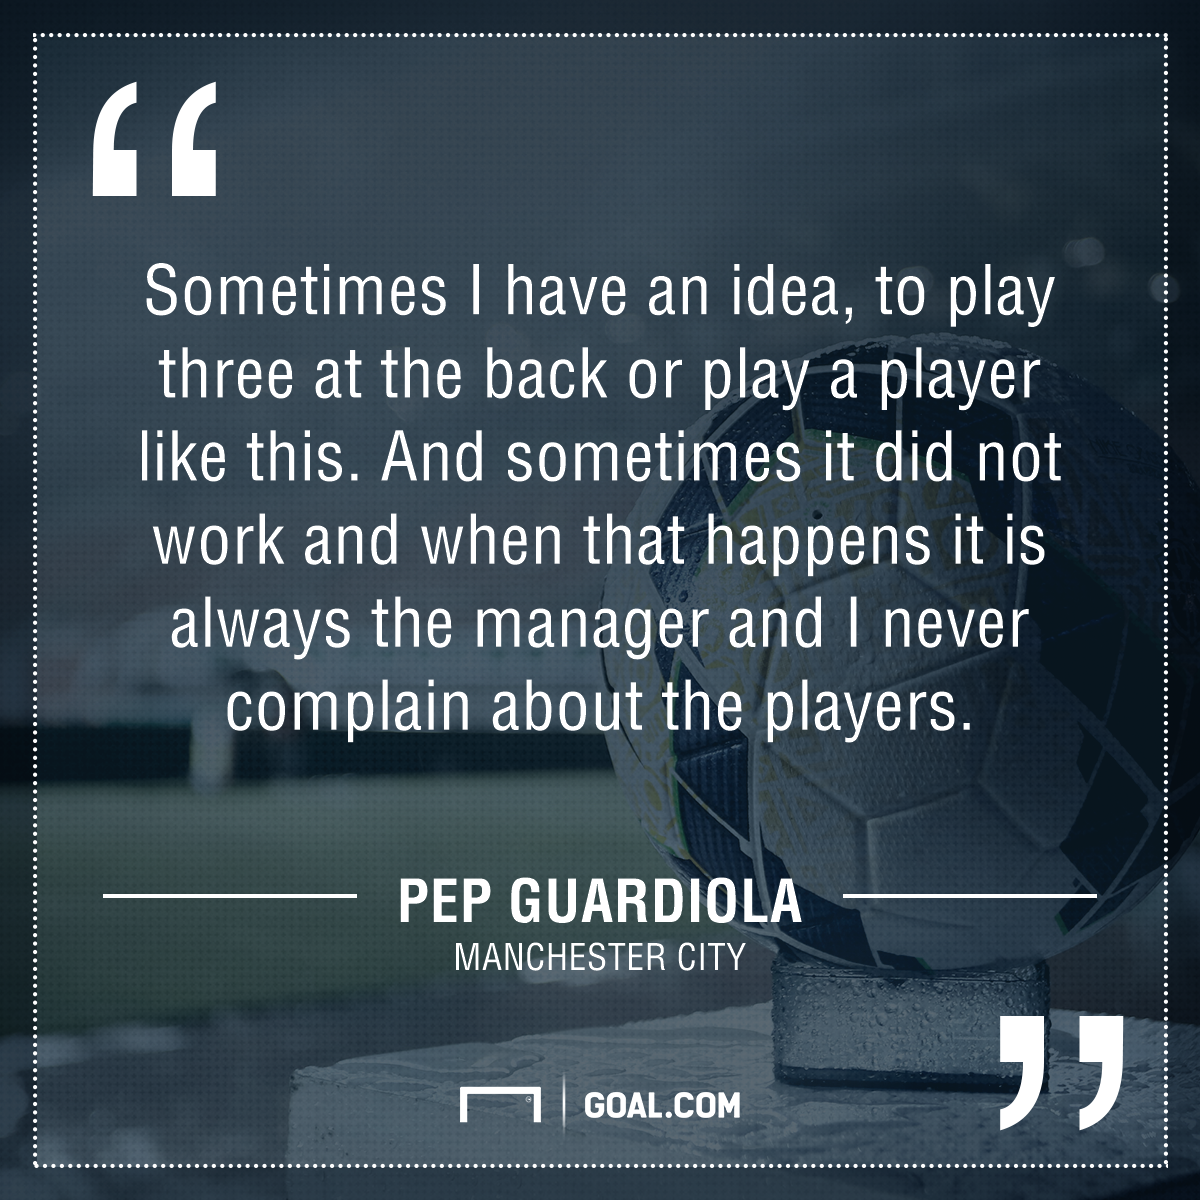 Guardiola quote mistake